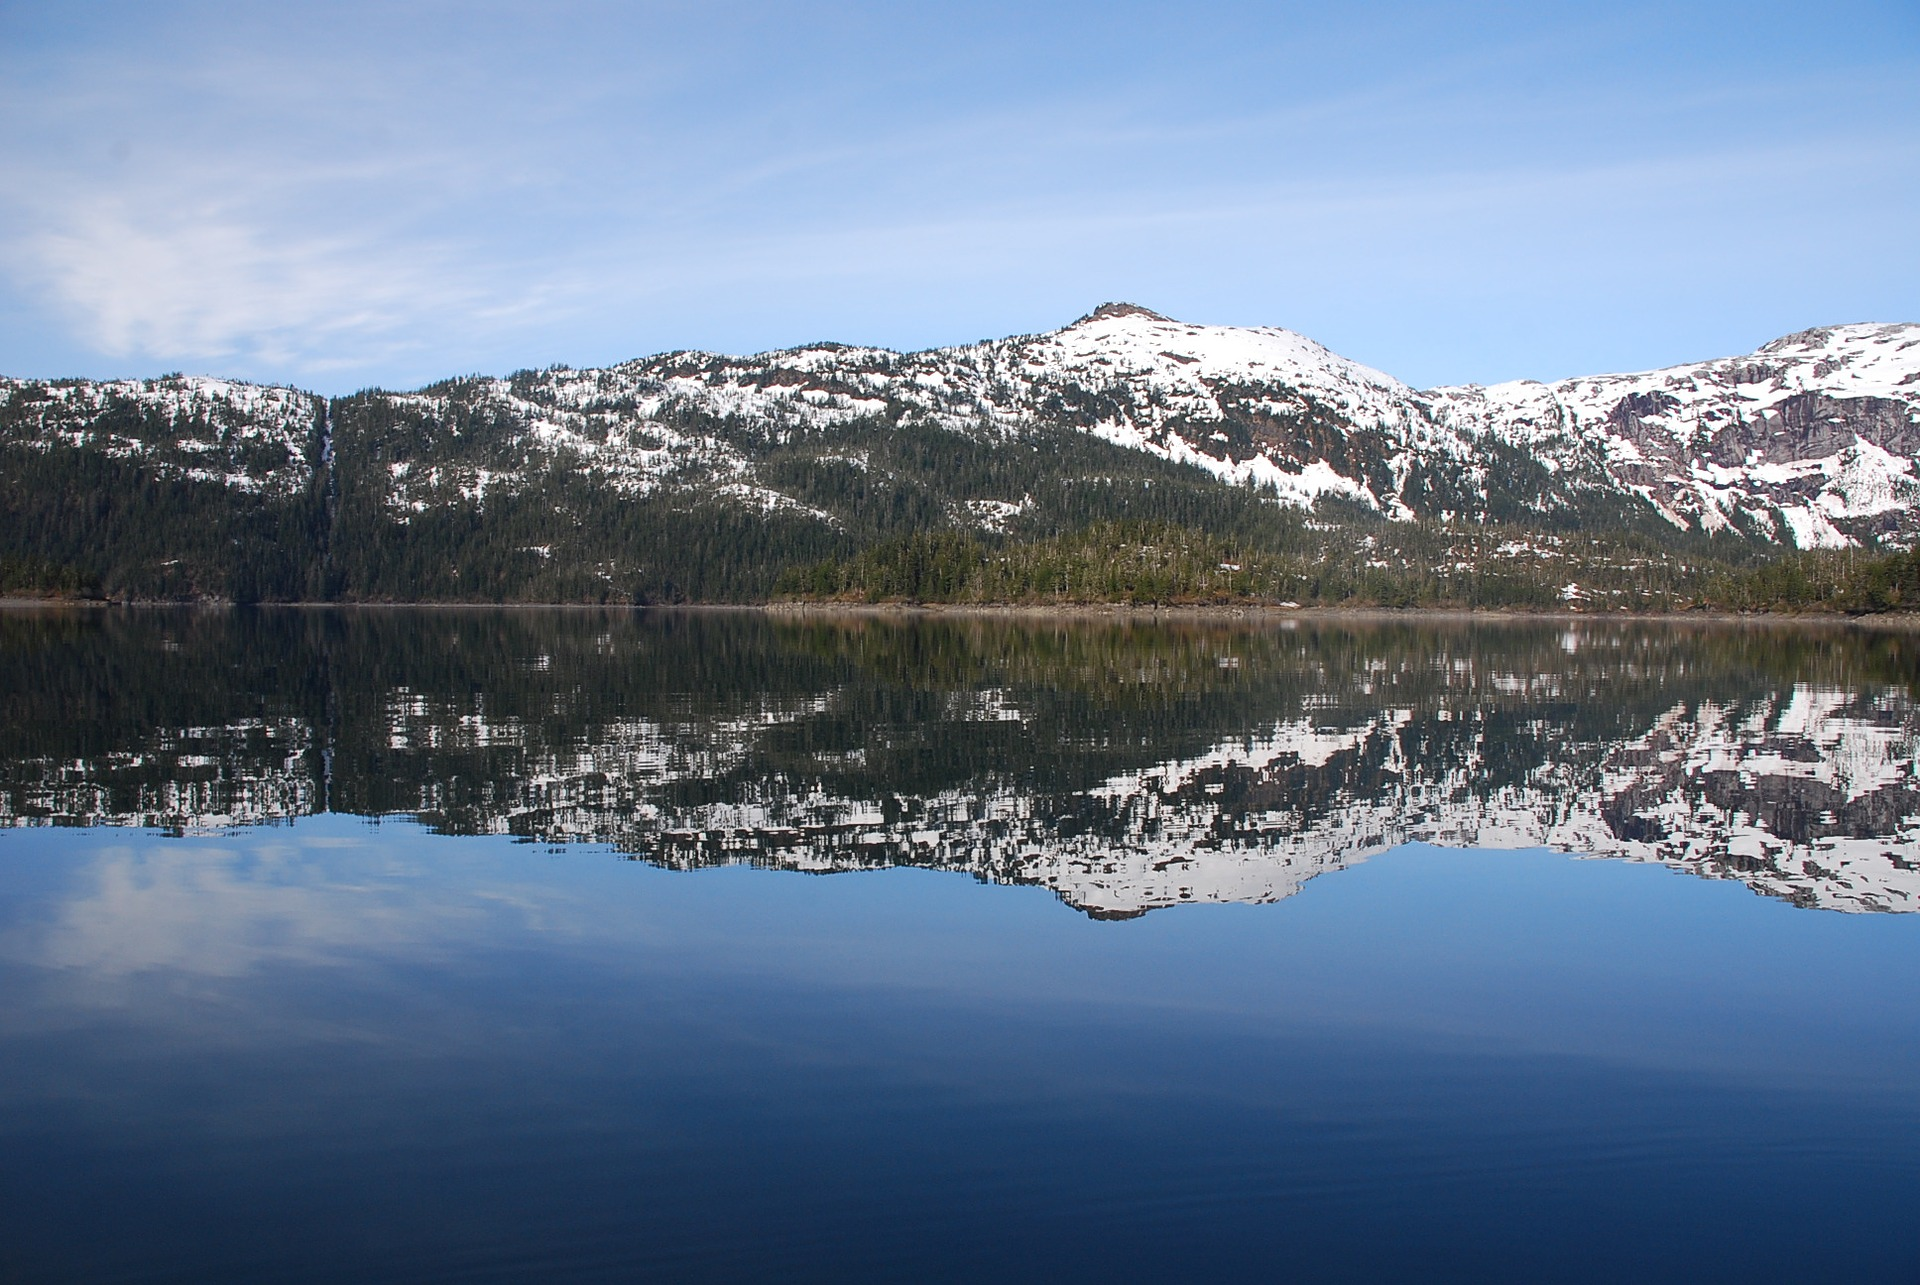 Paysage d'Alaska : baie du Prince William